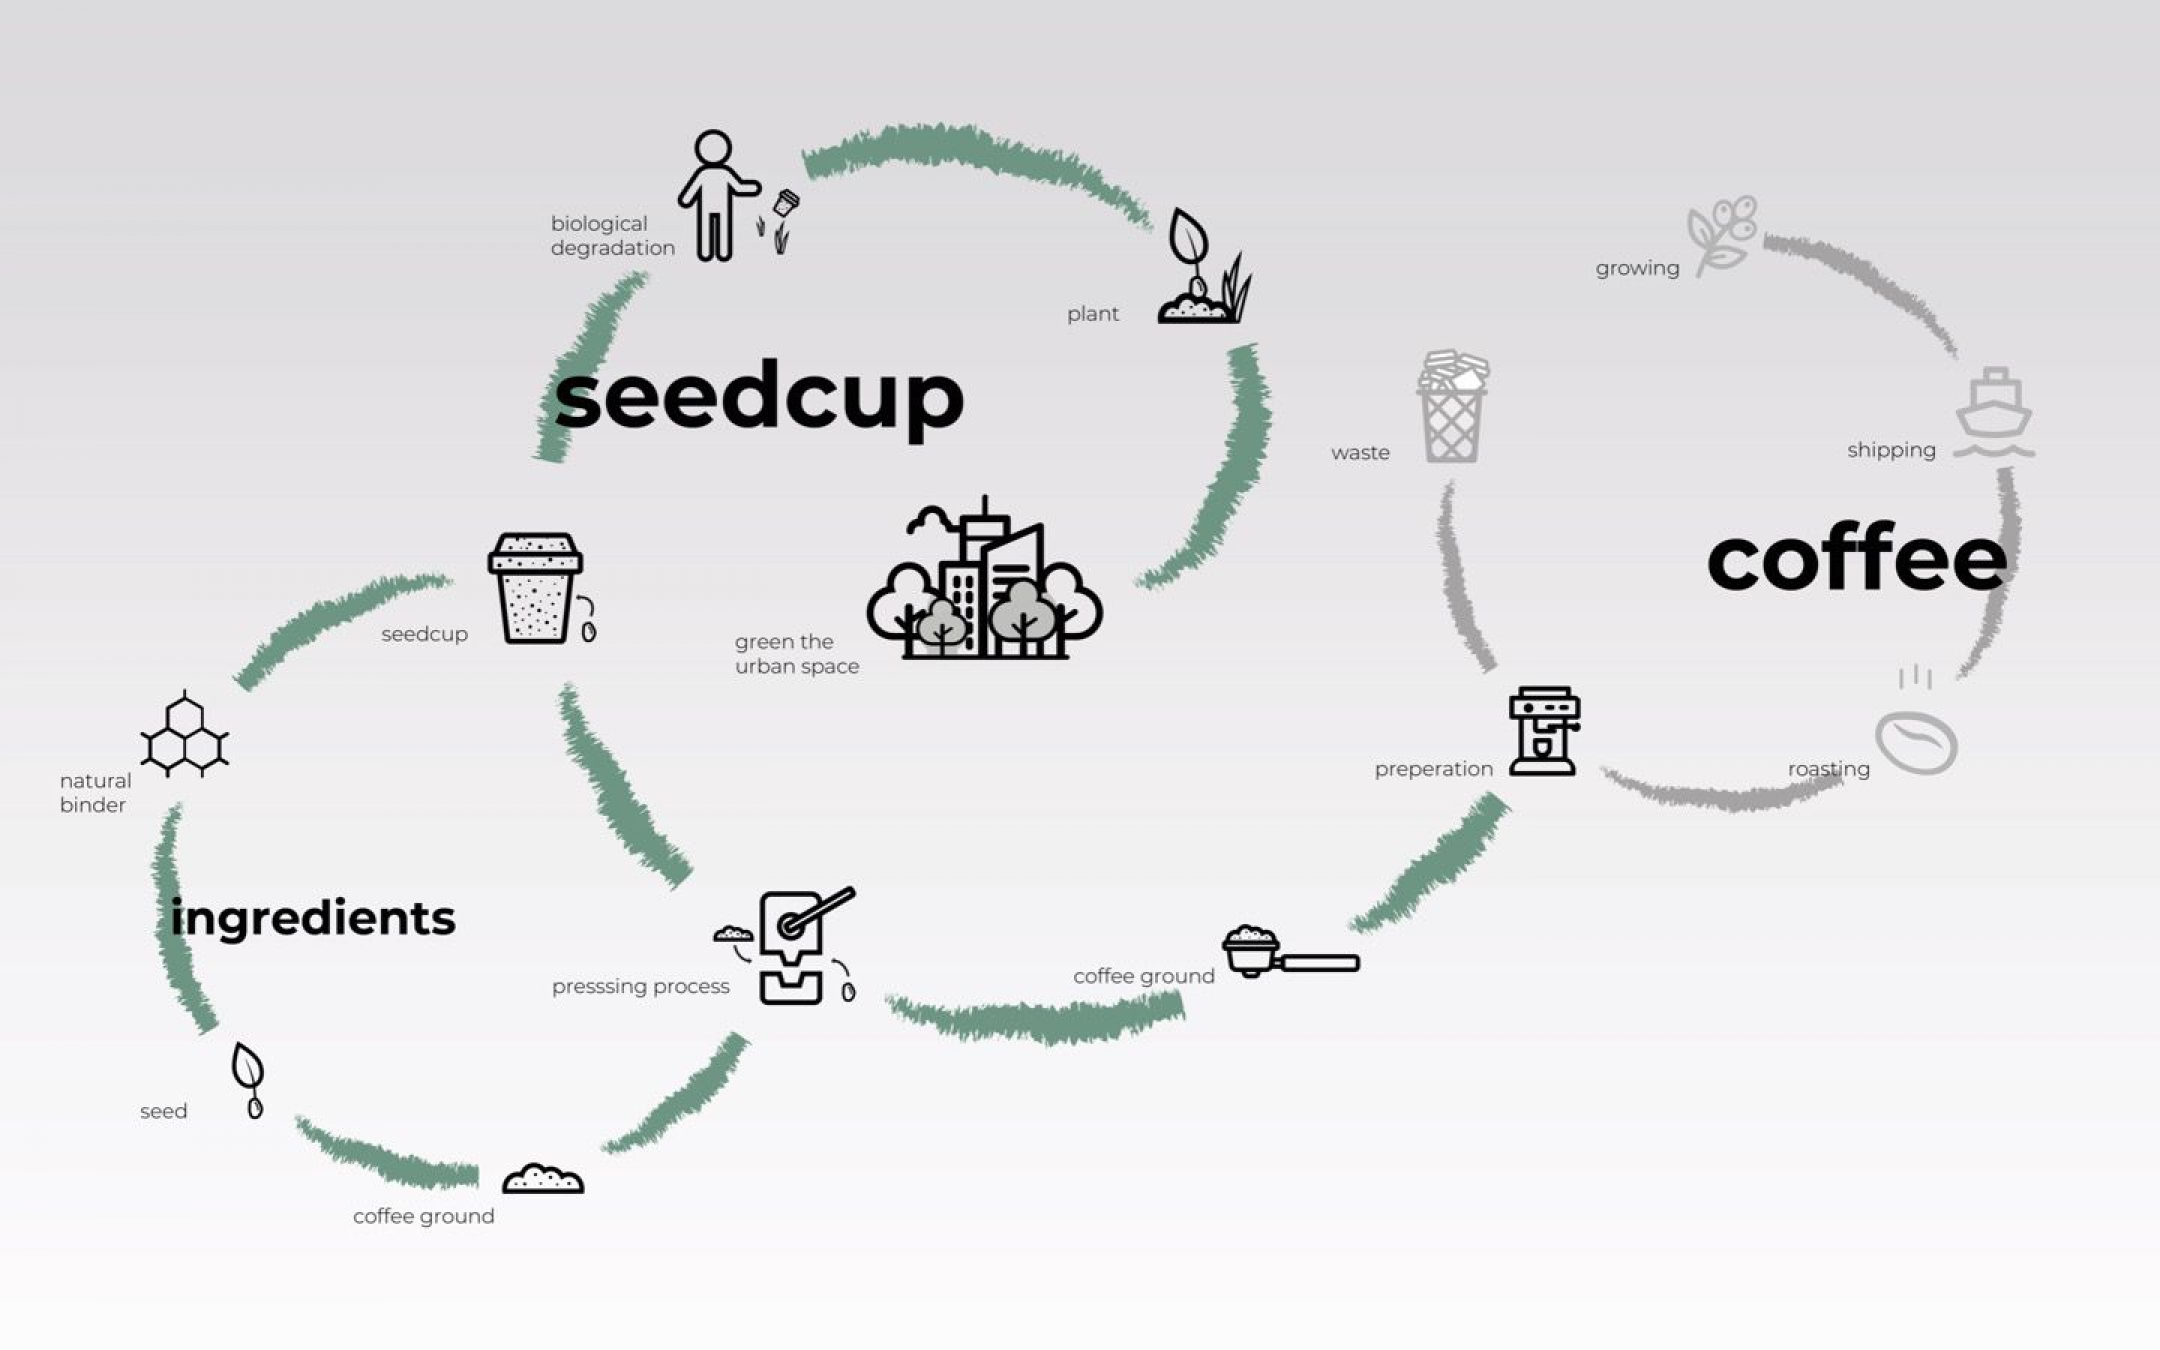 SeedCup